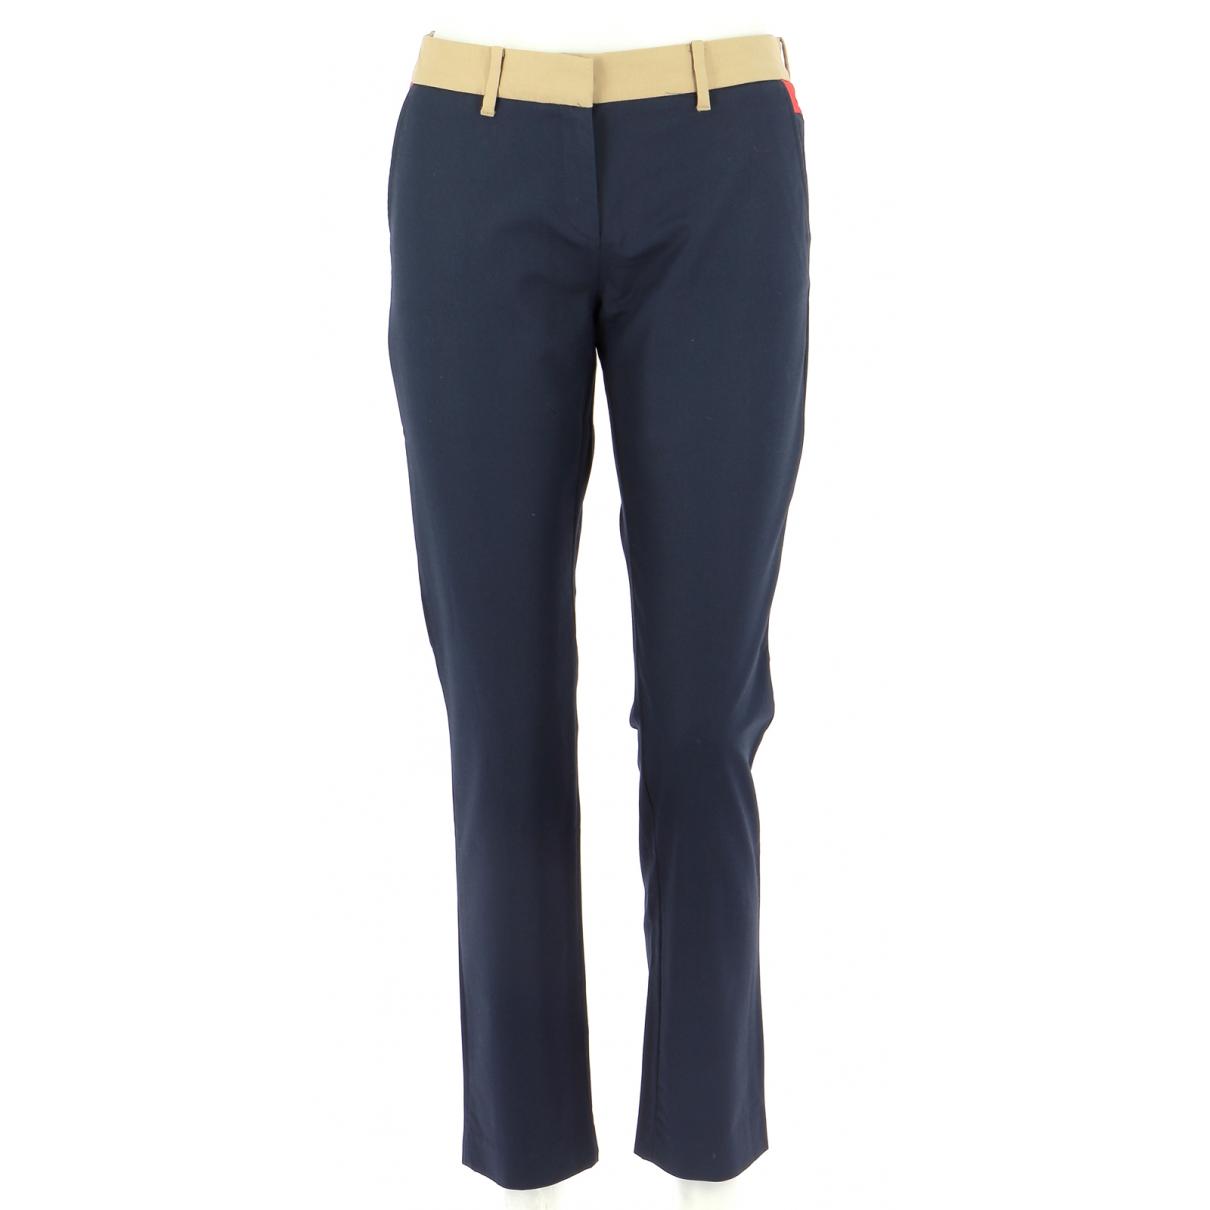 Pantalones en Algodon Marino Tommy Hilfiger